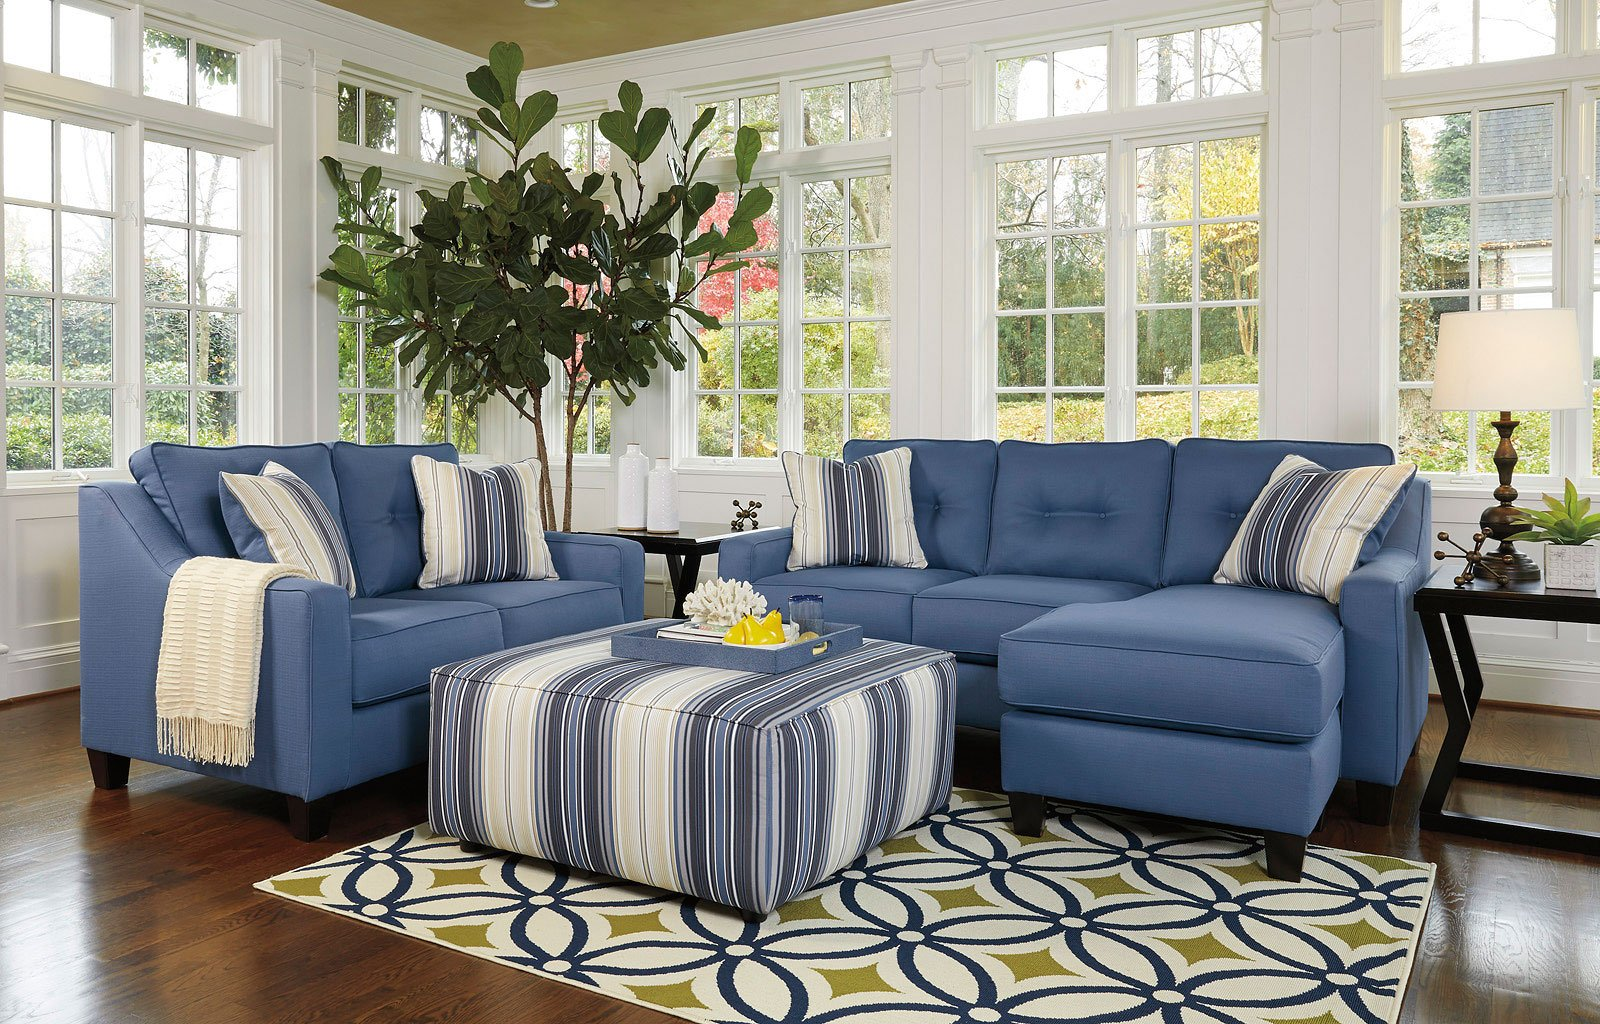 Aldie Nuvella Blue Living Room Set BenchCraft, 2 Reviews